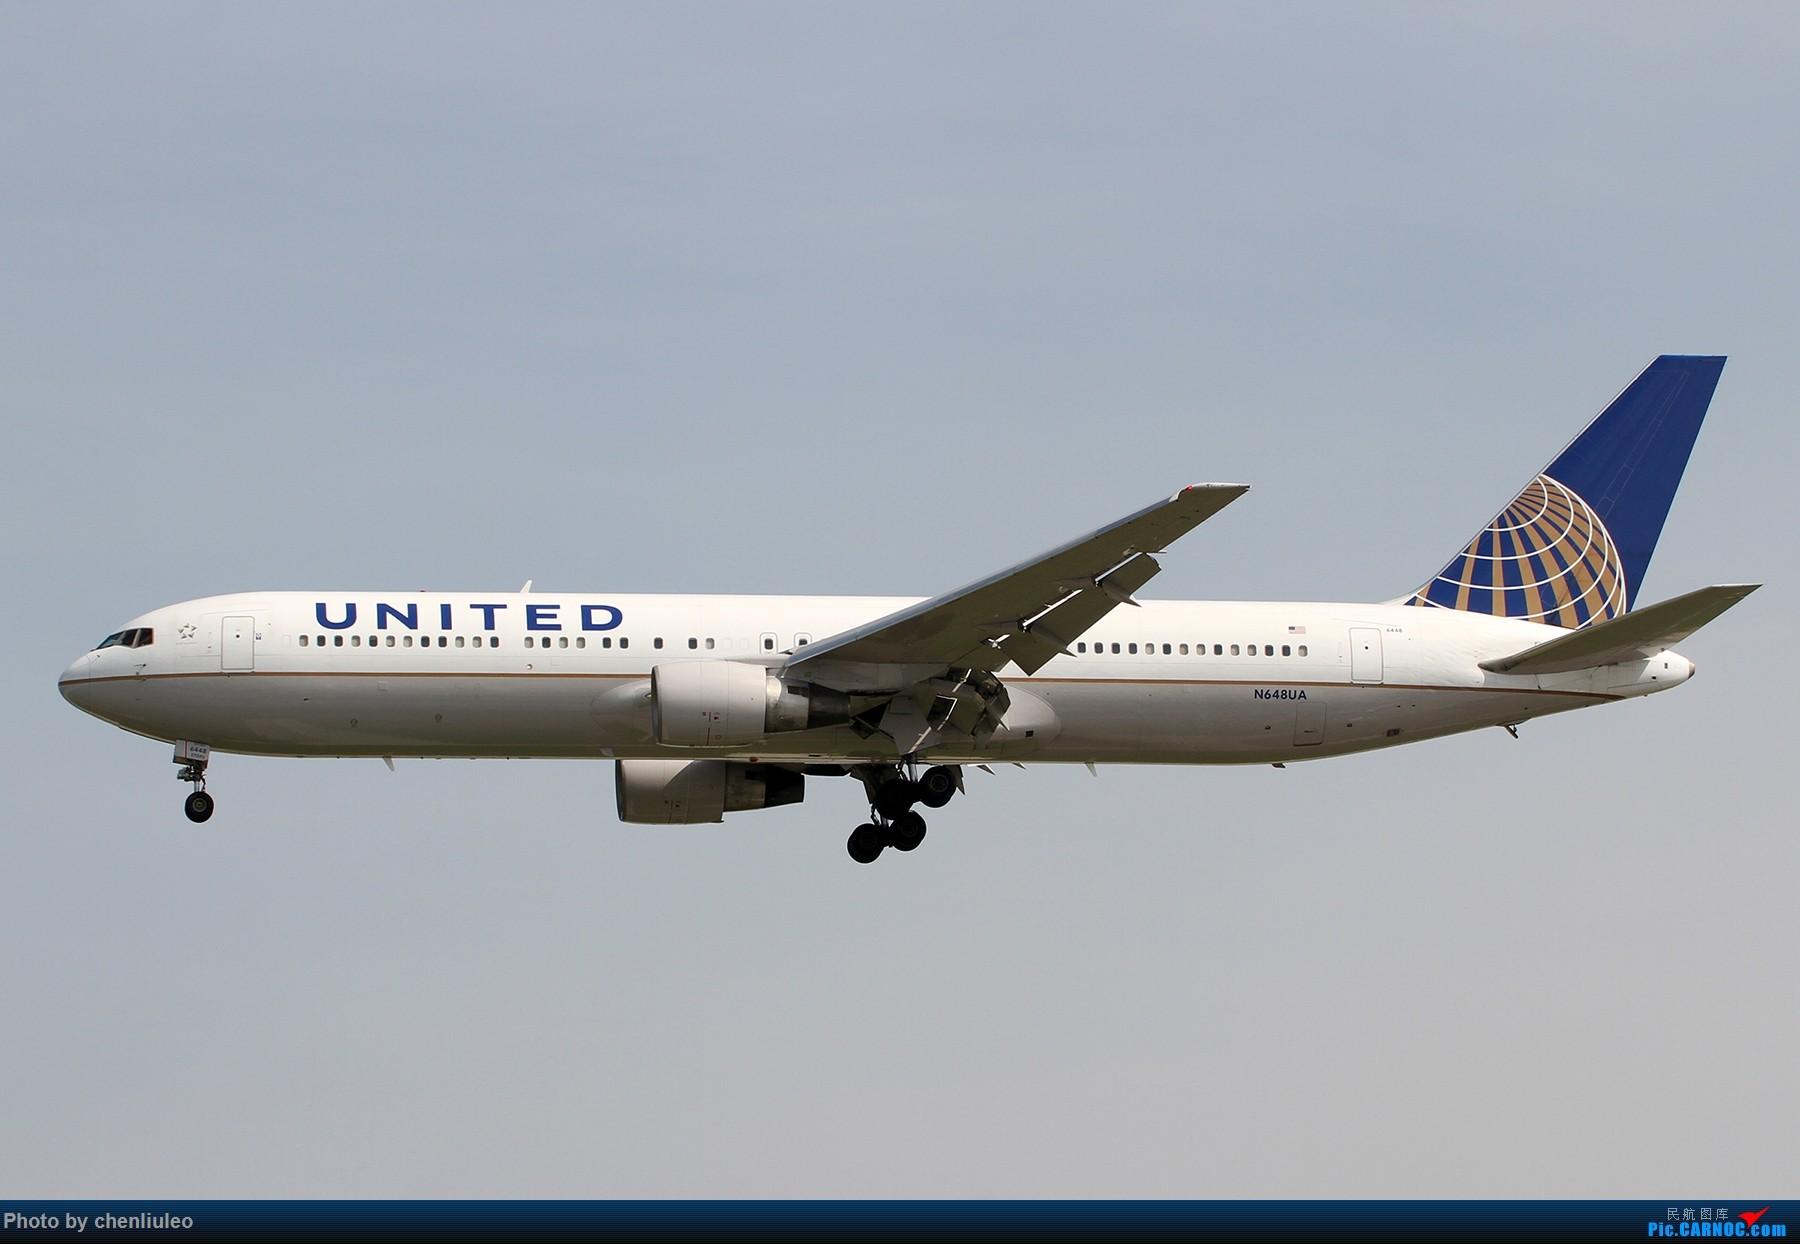 Re:[原创]【北美飞友会】芝加哥奥黑尔机场首拍 BOEING 767-300ER N648UA 美国芝加哥奥黑尔国际机场